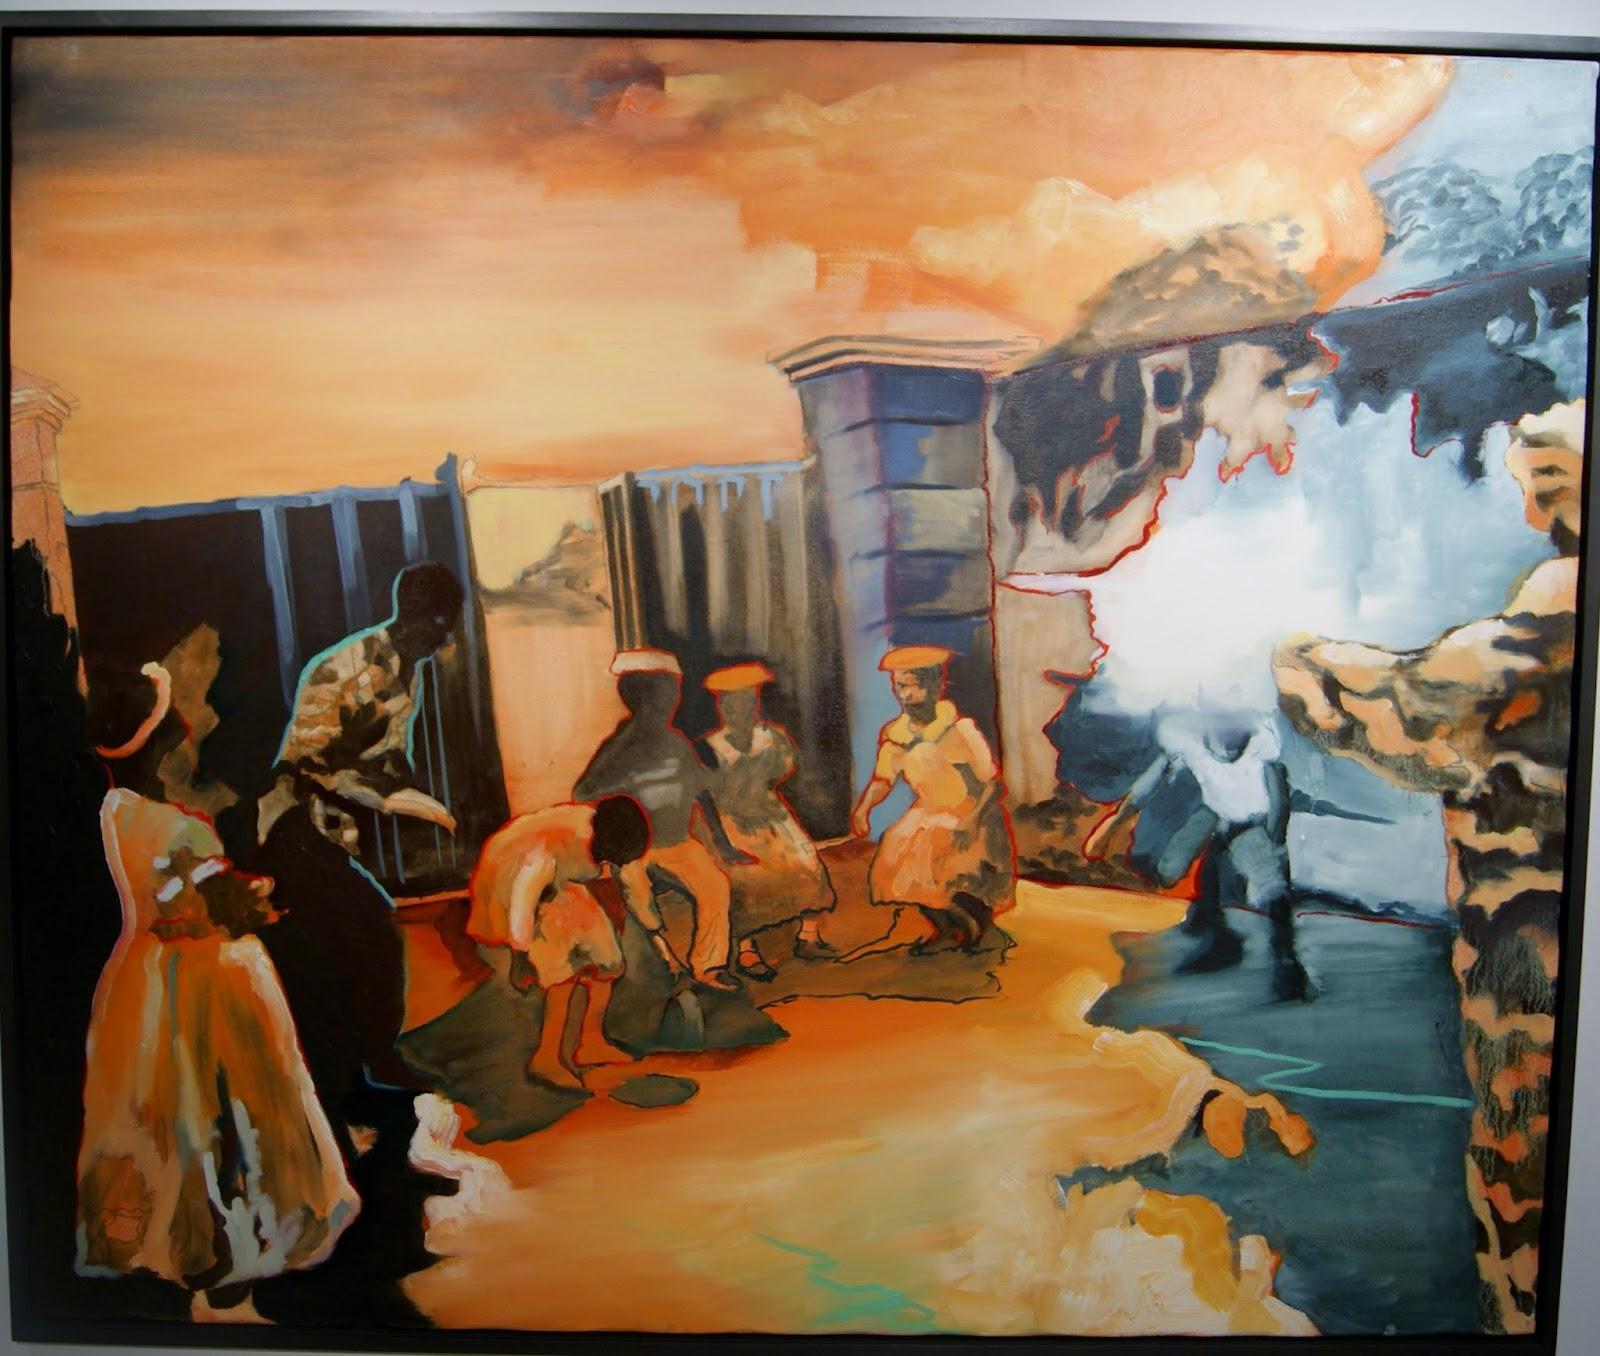 BMO 1st Art! Student Competition Exhibit at MOCCA: Alberta Winner, Conundrum, Emmanuel Osahor, Culture, Contemporary, Artmatters, Museum, Toronto, Ontario, Canada, The Purple Scarf, Melanie.Ps